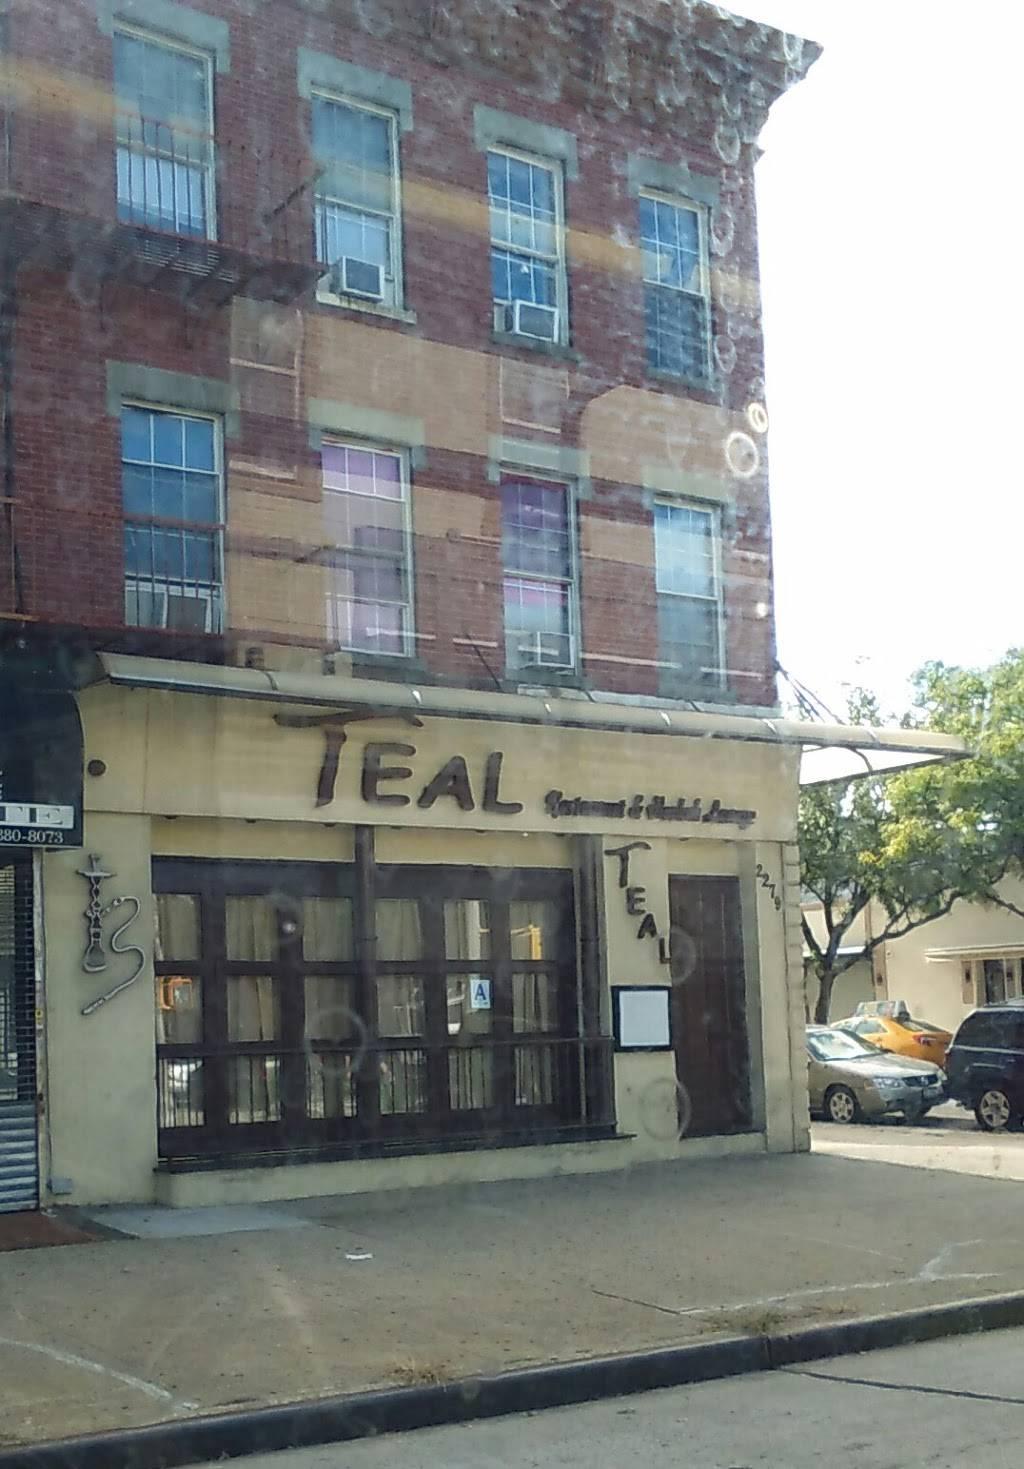 Teal | restaurant | 22-79 Steinway St, Astoria, NY 11105, USA | 9177450057 OR +1 917-745-0057